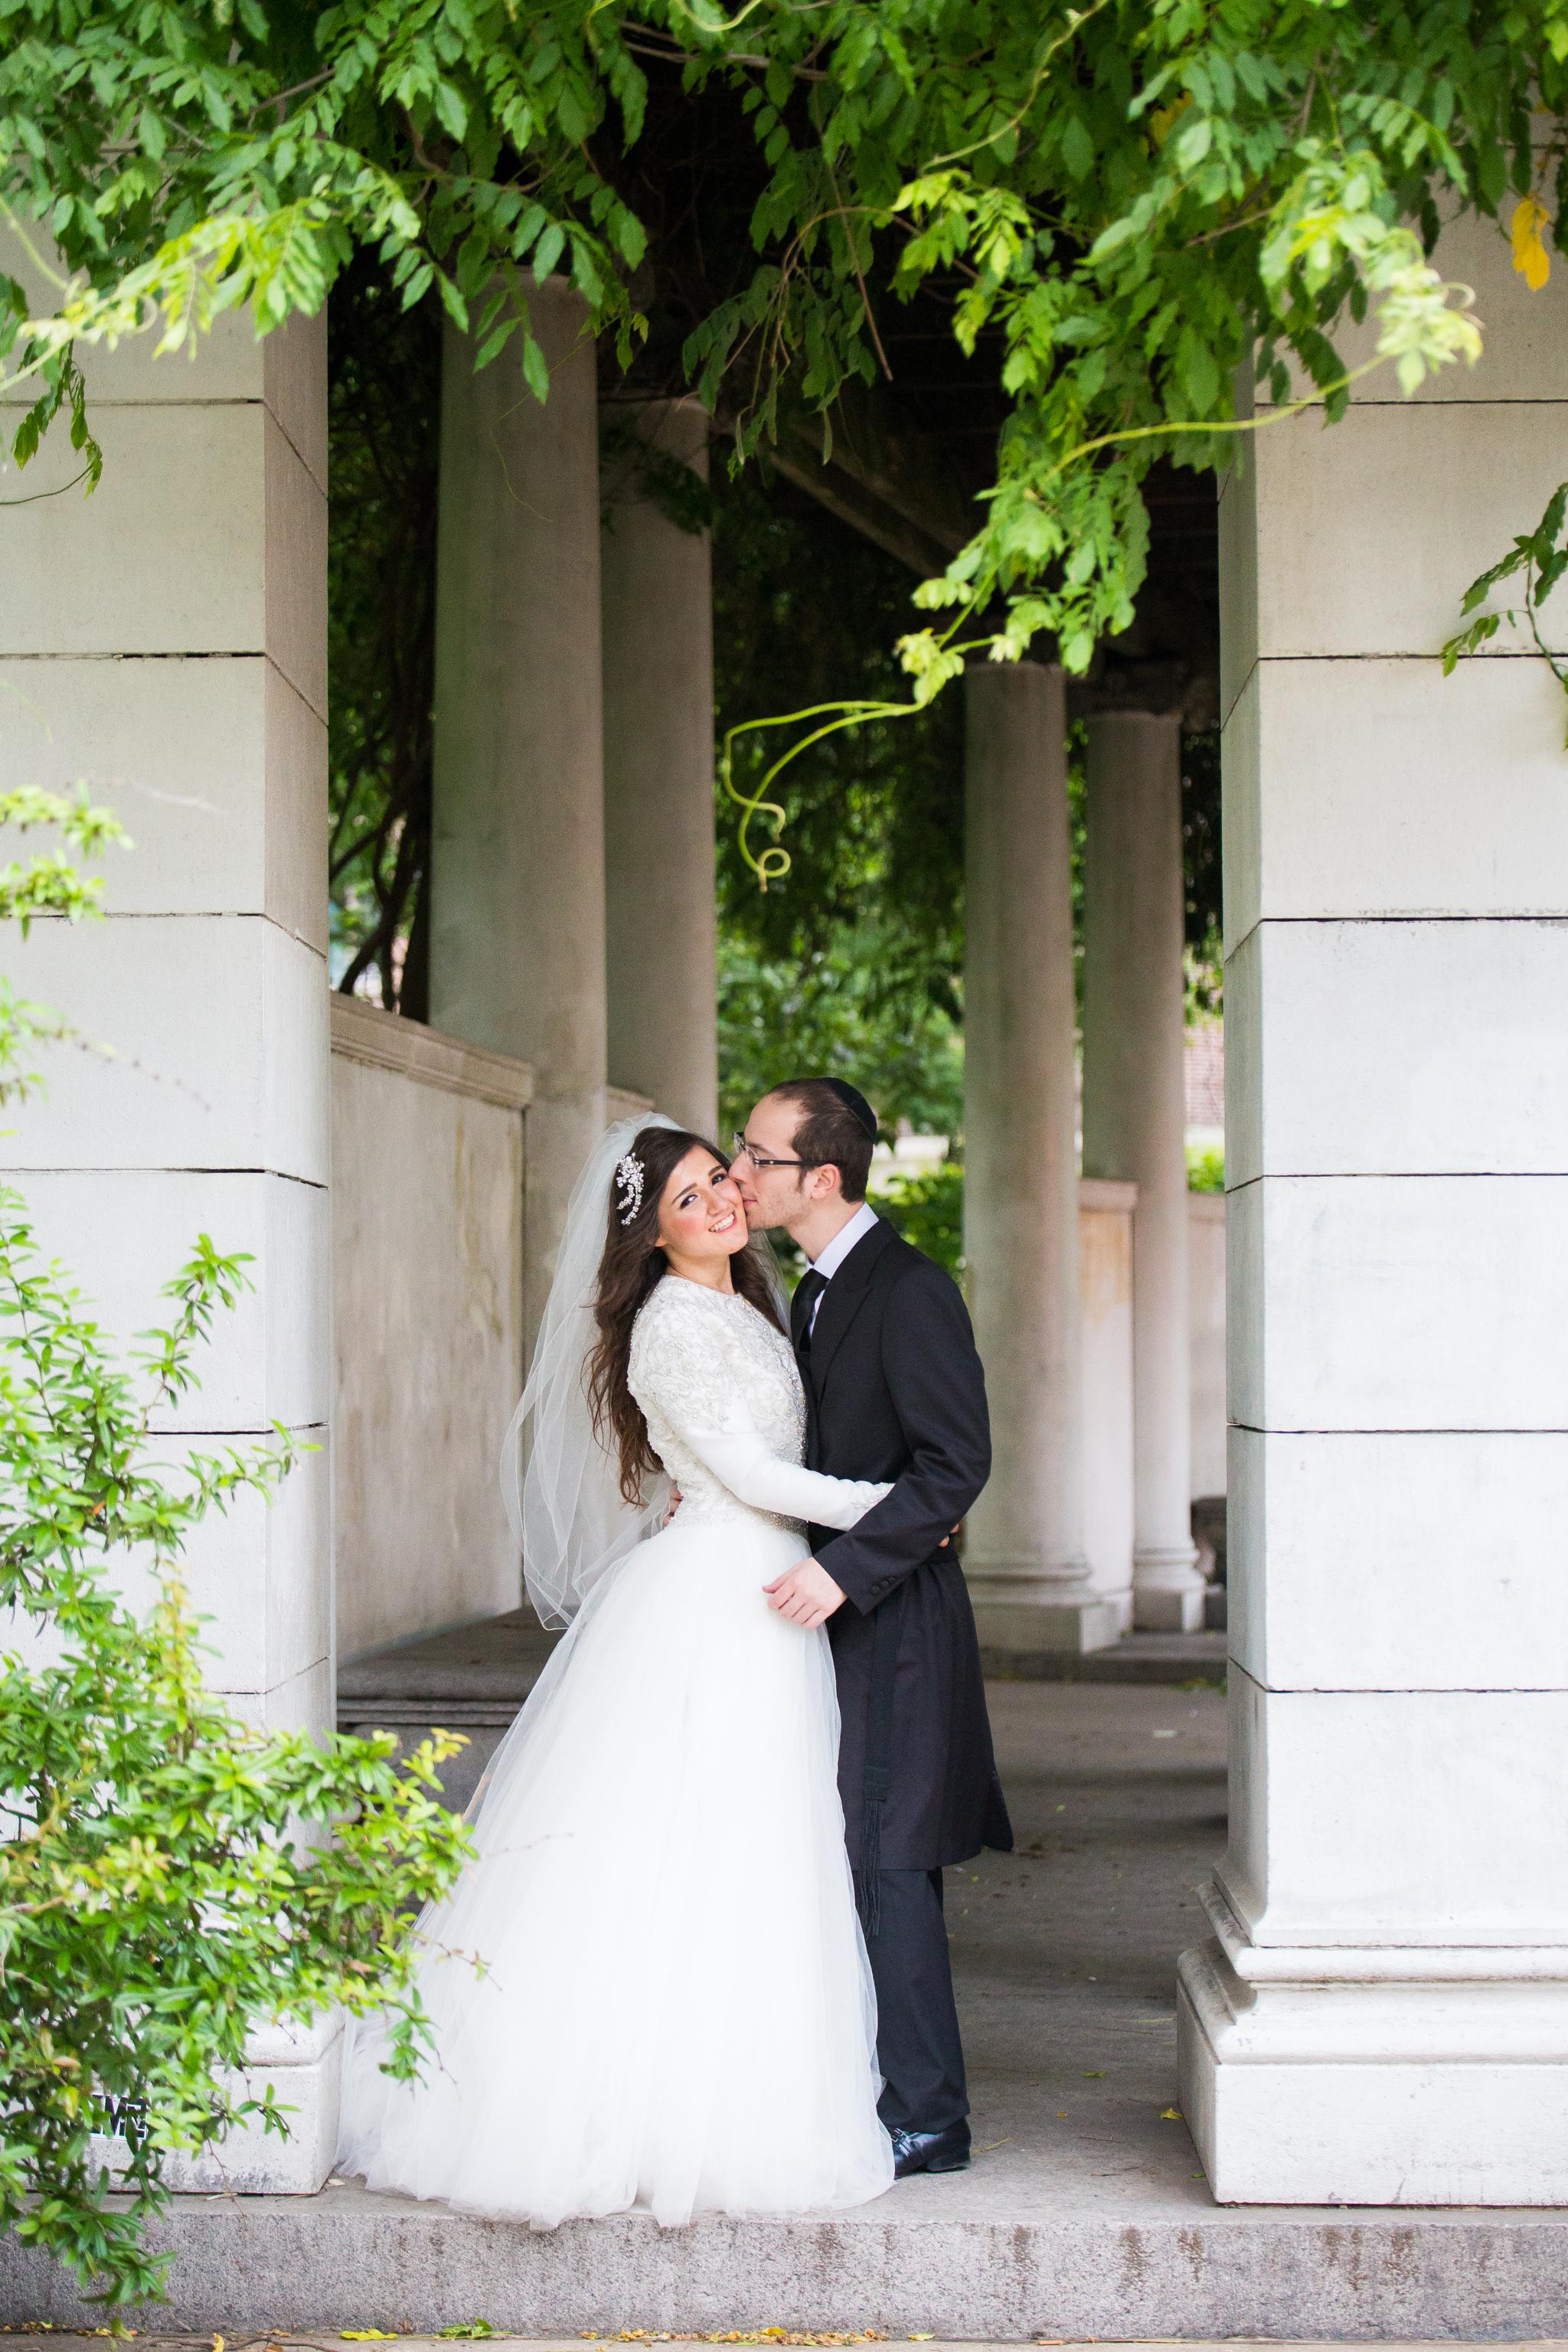 Wedding Iossi and Gitty Khafif  - Eliau Piha studio photography, new york, events, people 770 brooklyn -0726.jpg